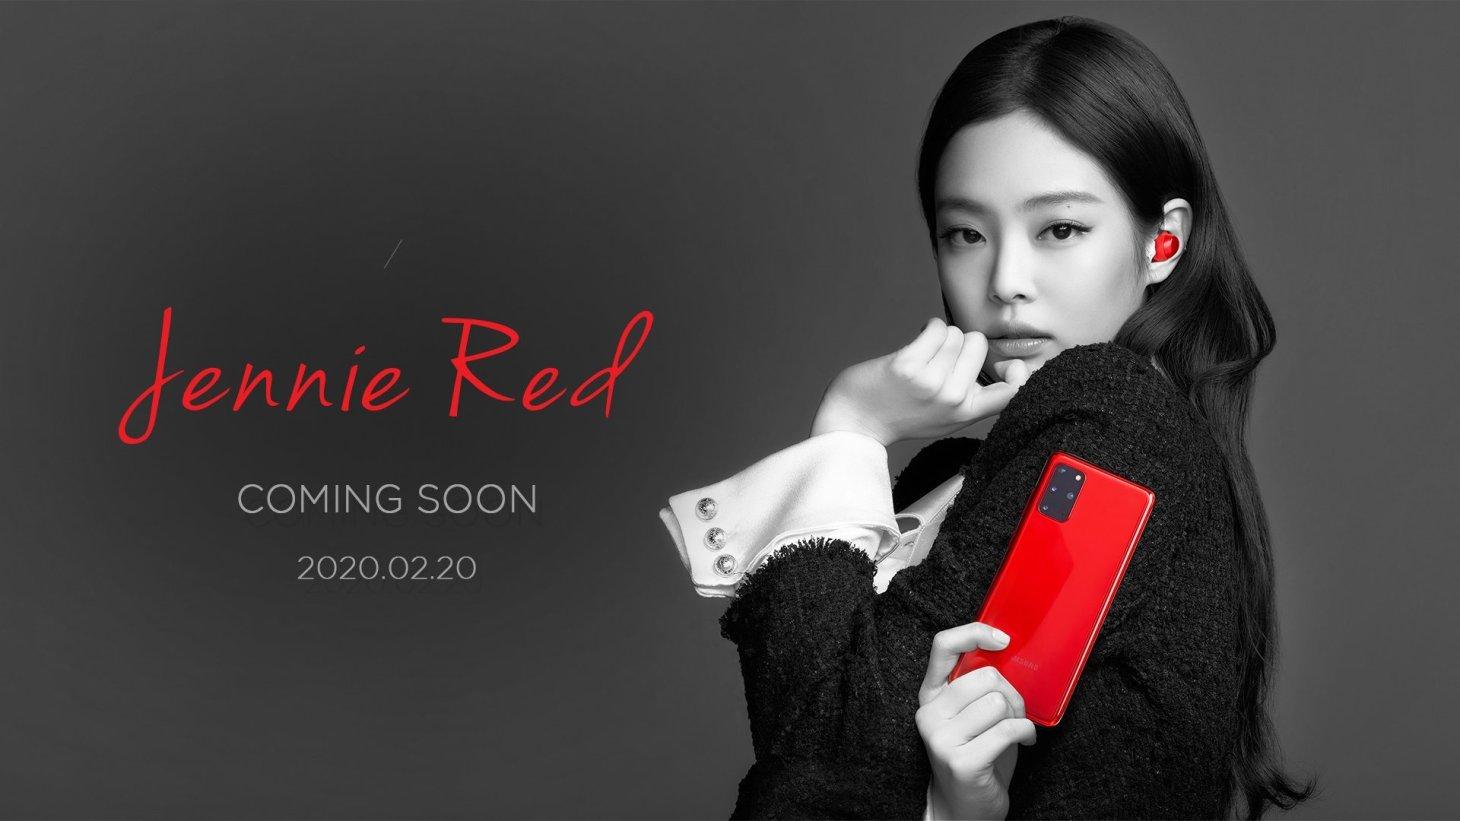 1-BLACKPINK-Jennie-Red-KT-Korea-Telecom-Samsung-S20